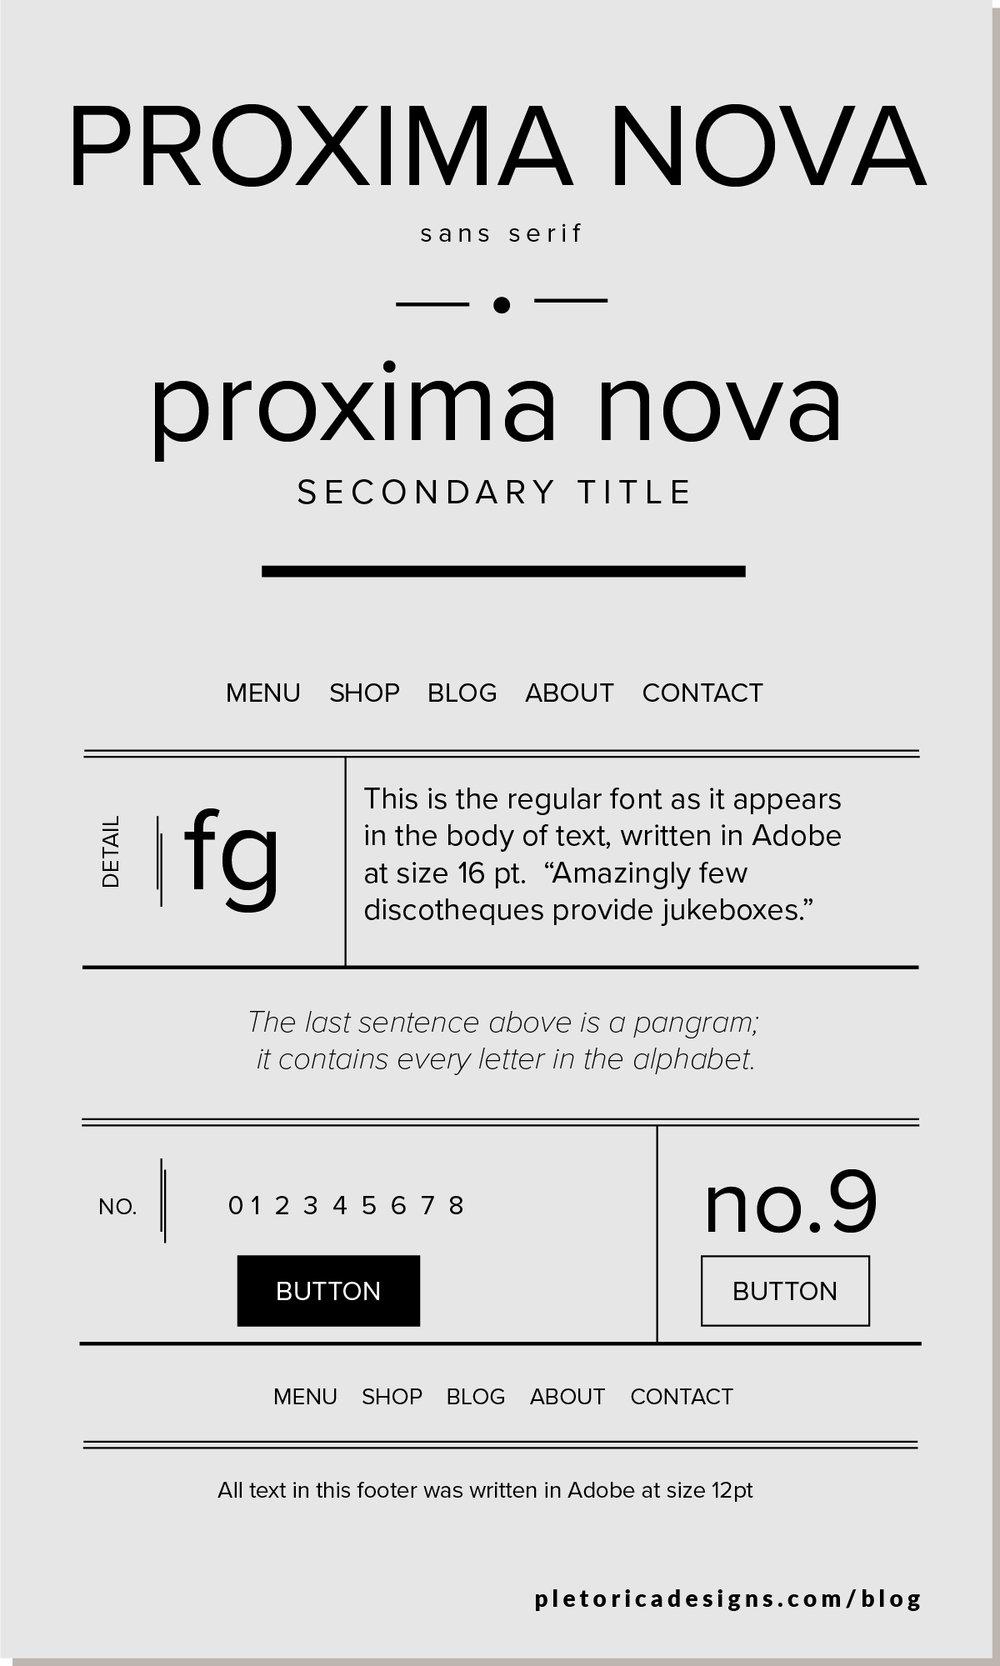 LET'S TYPE: Proxima Nova — PLETÓRICA DESIGNS